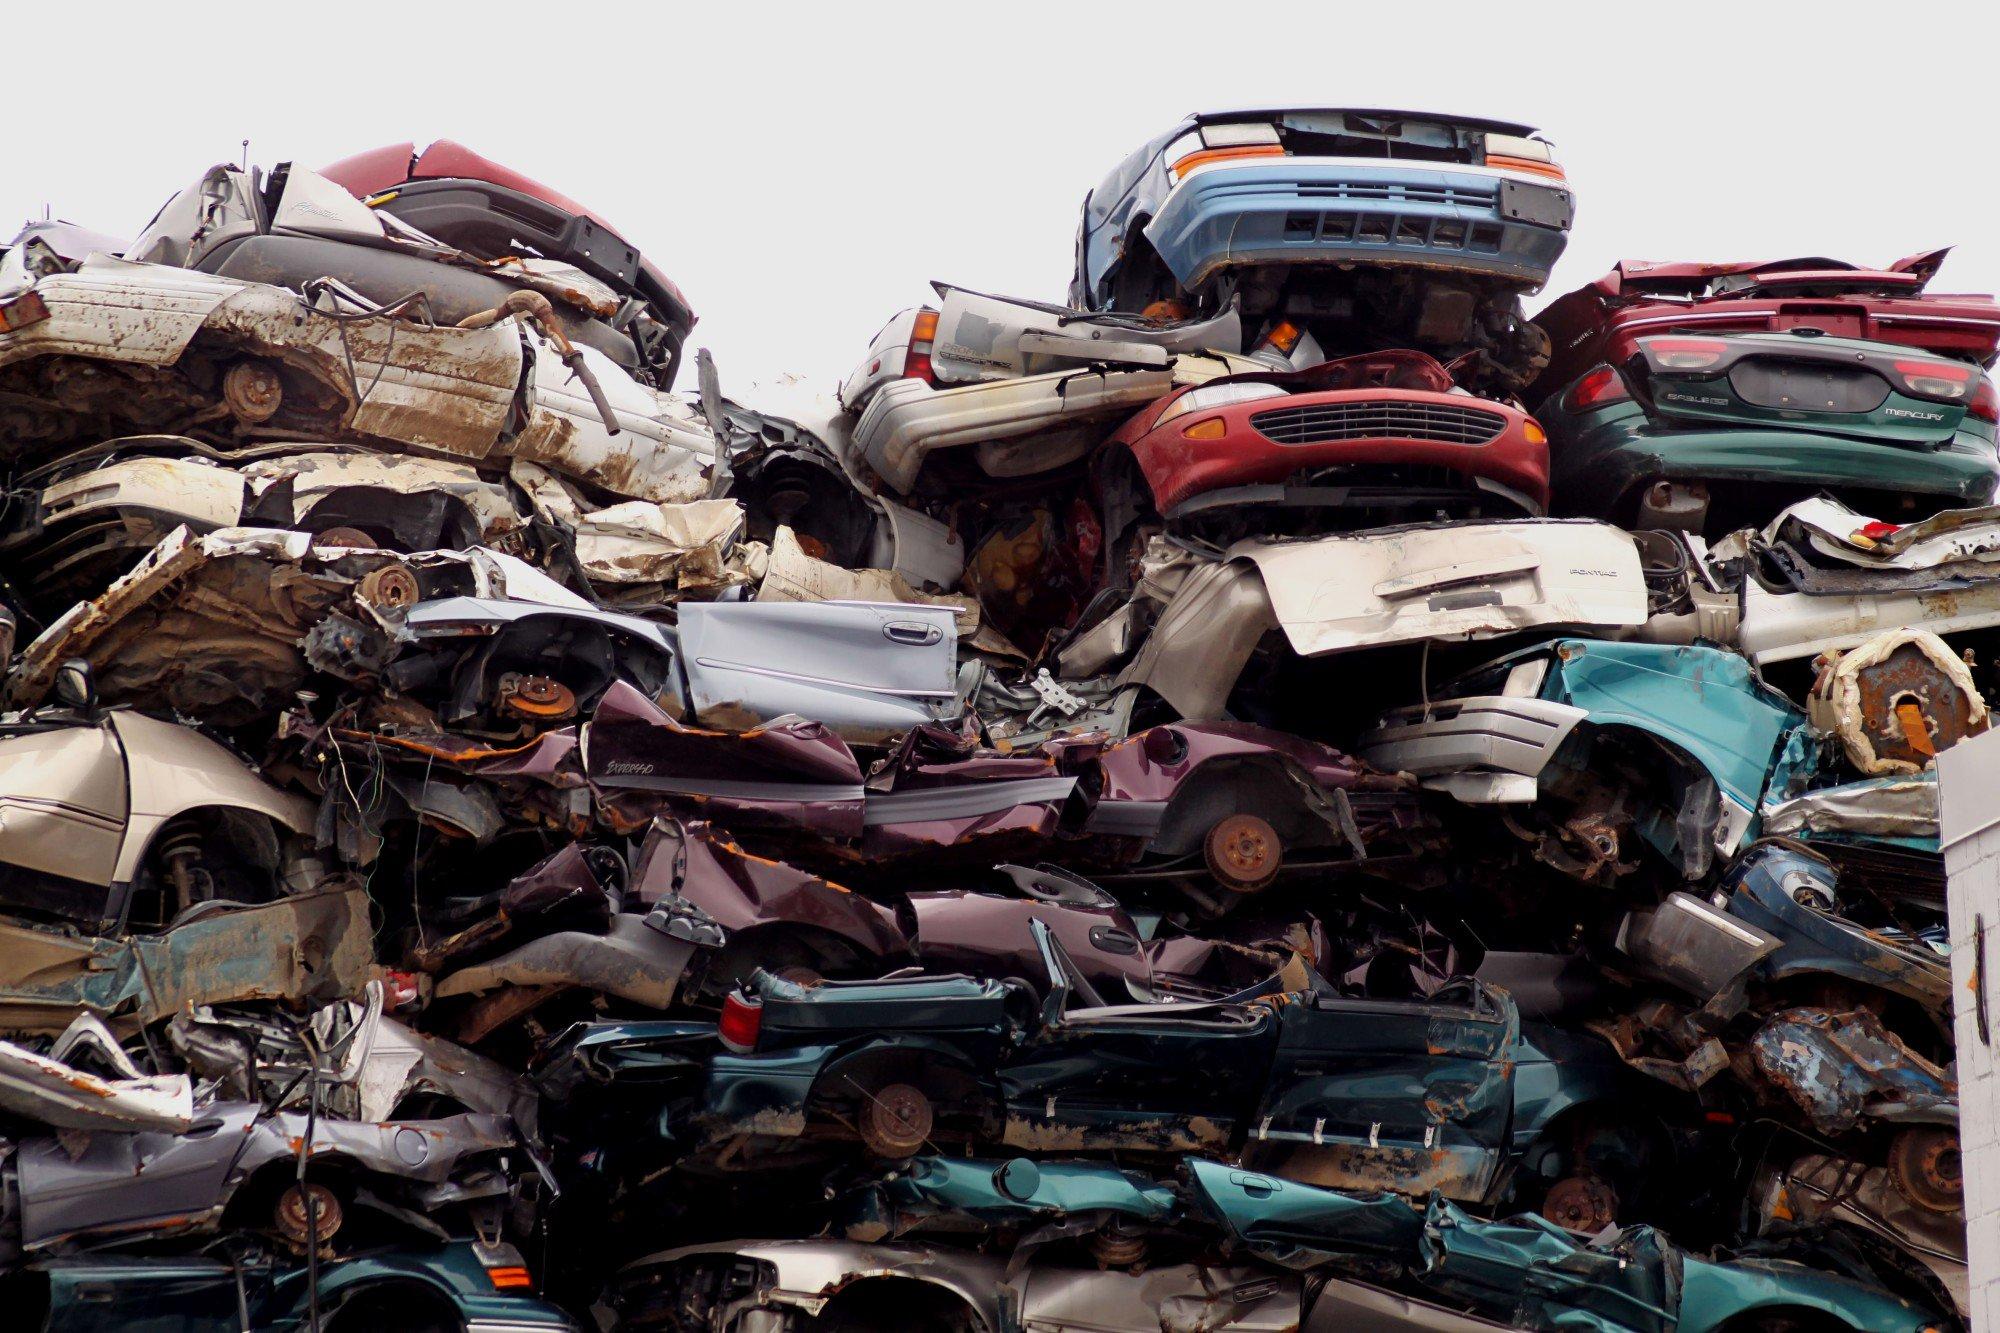 15 Things to Do Before You Scrap a Car in Atlanta